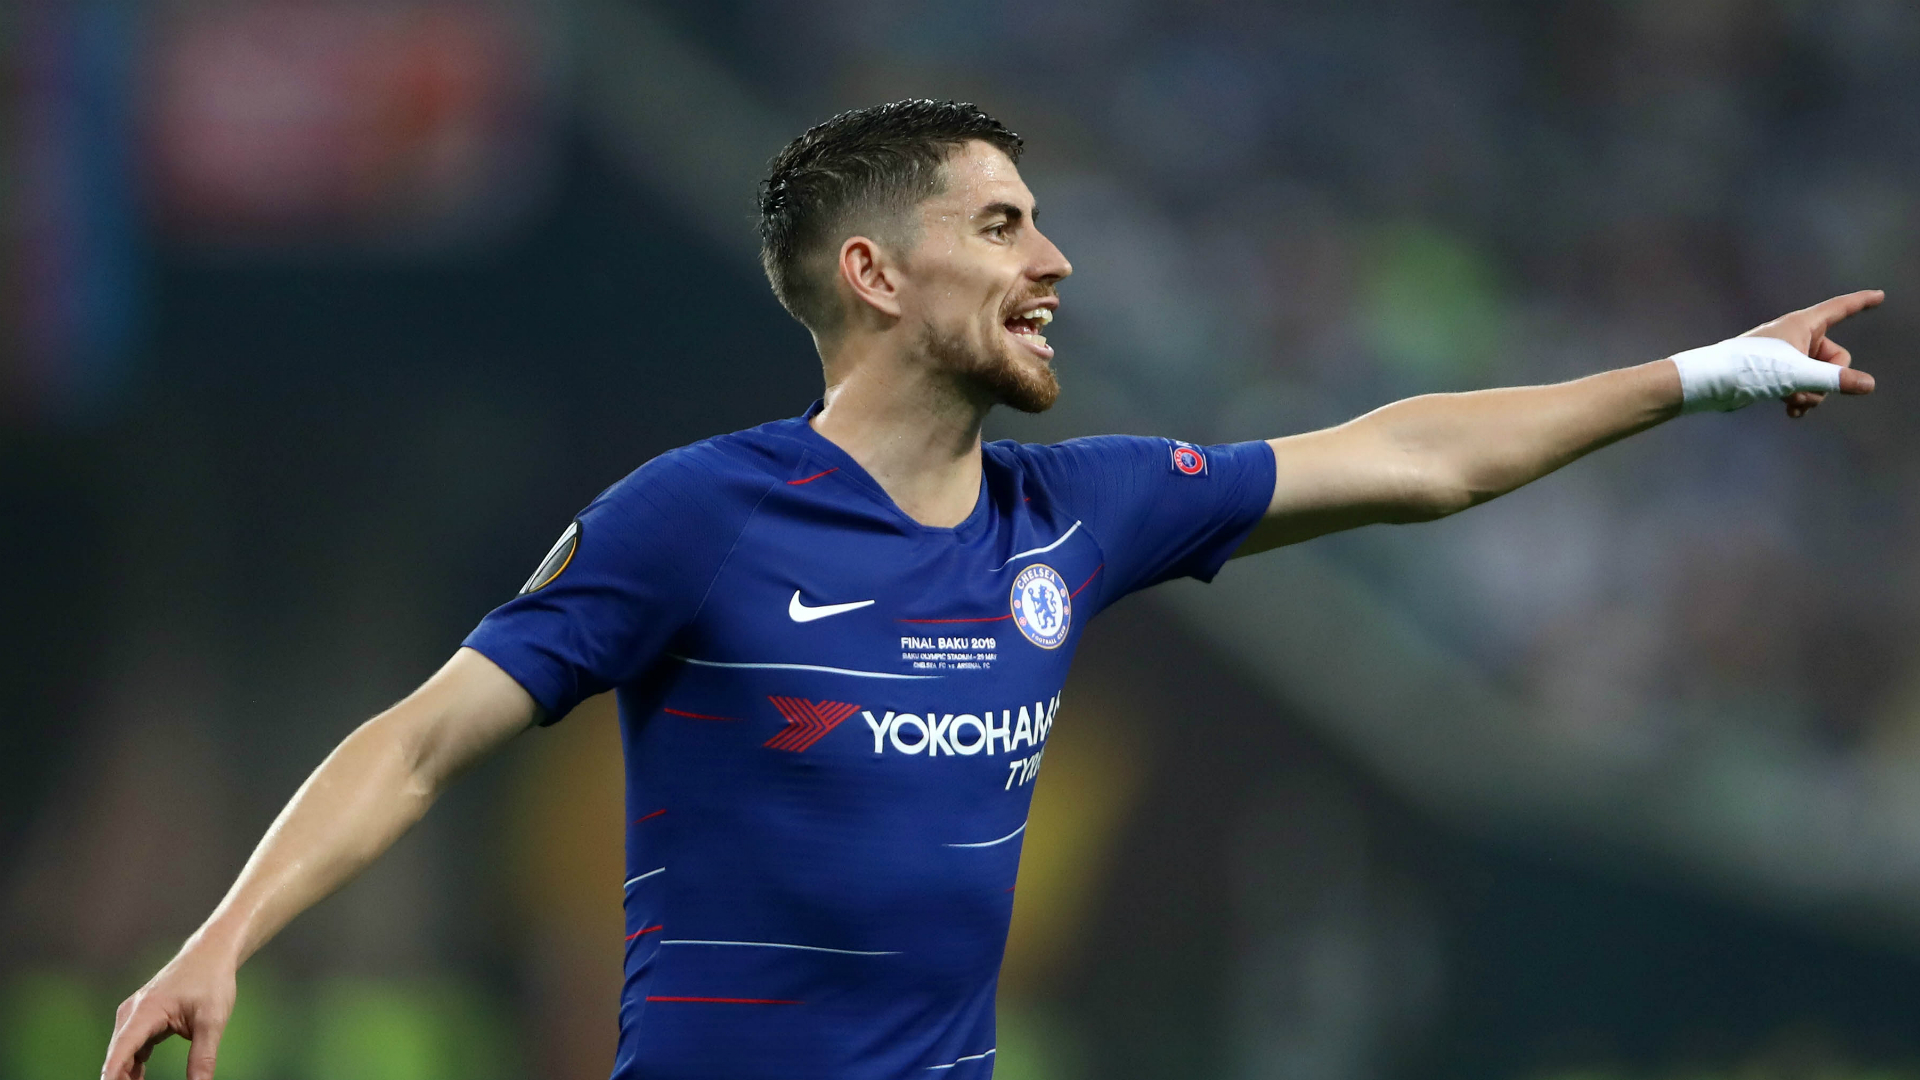 'Leader' Jorginho has replaced Barkley as penalty taker, Lampard confirms